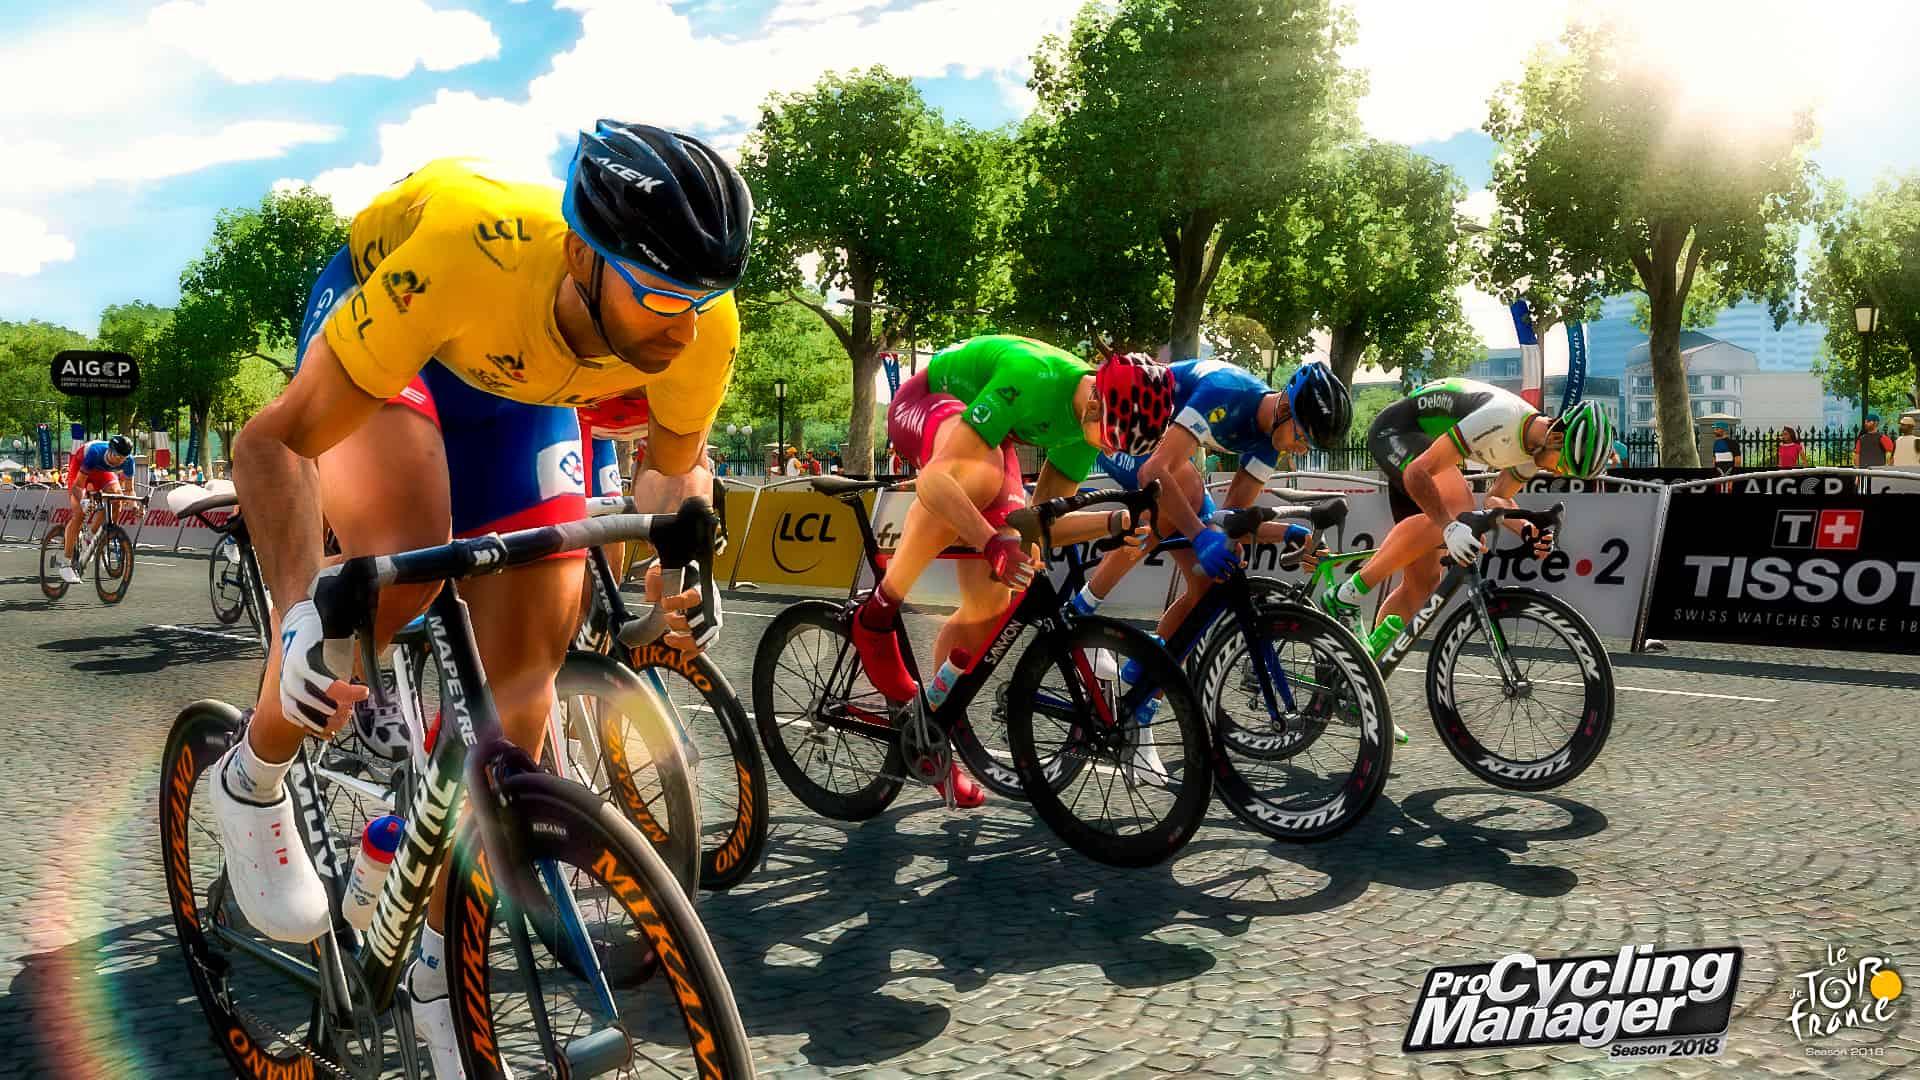 Pro Cyclist Mark Cavendish's Diet Rules